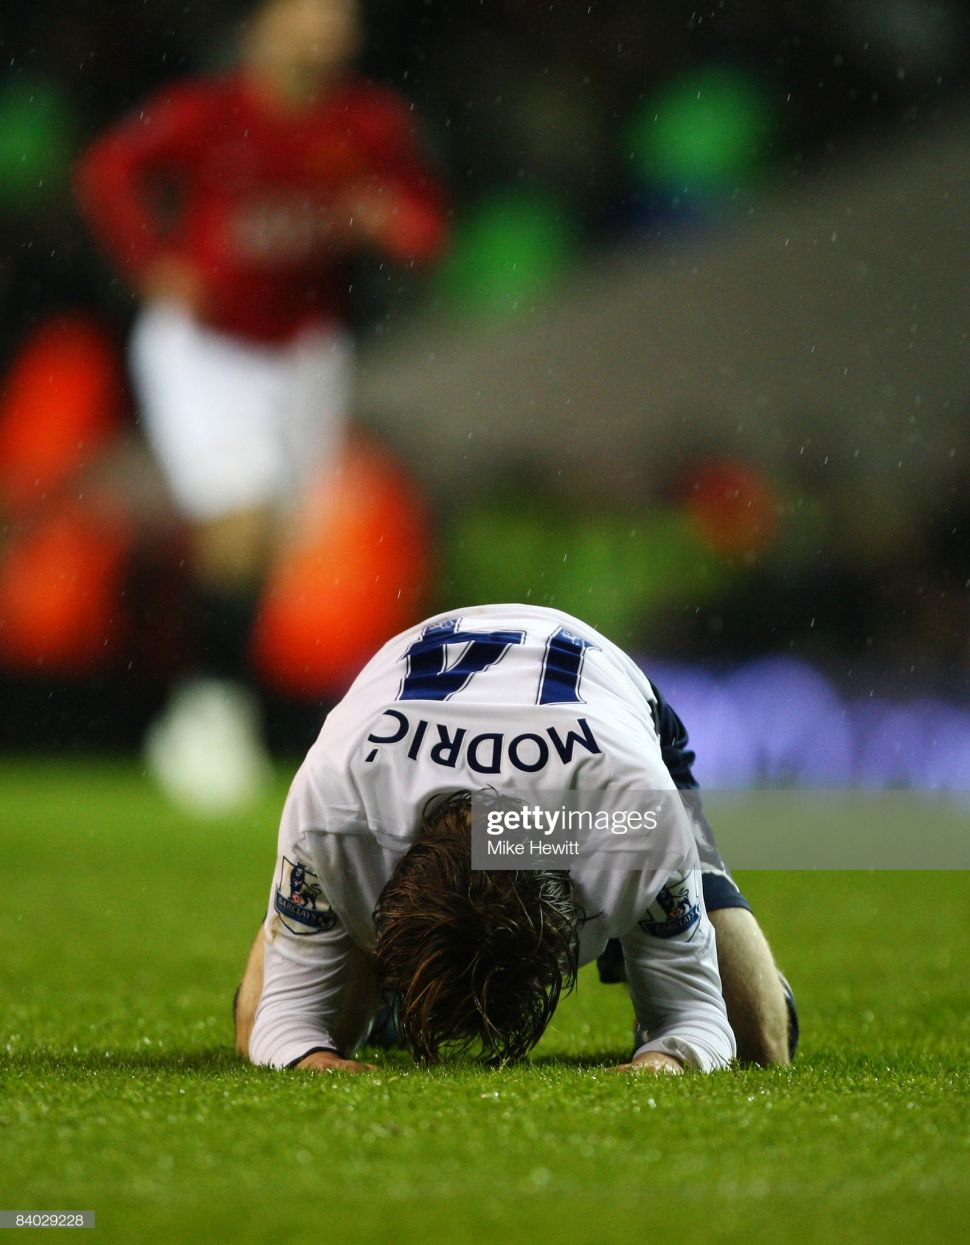 Áo đấu Modric #14 Tottenham 2008-2009 home shirt jersey white